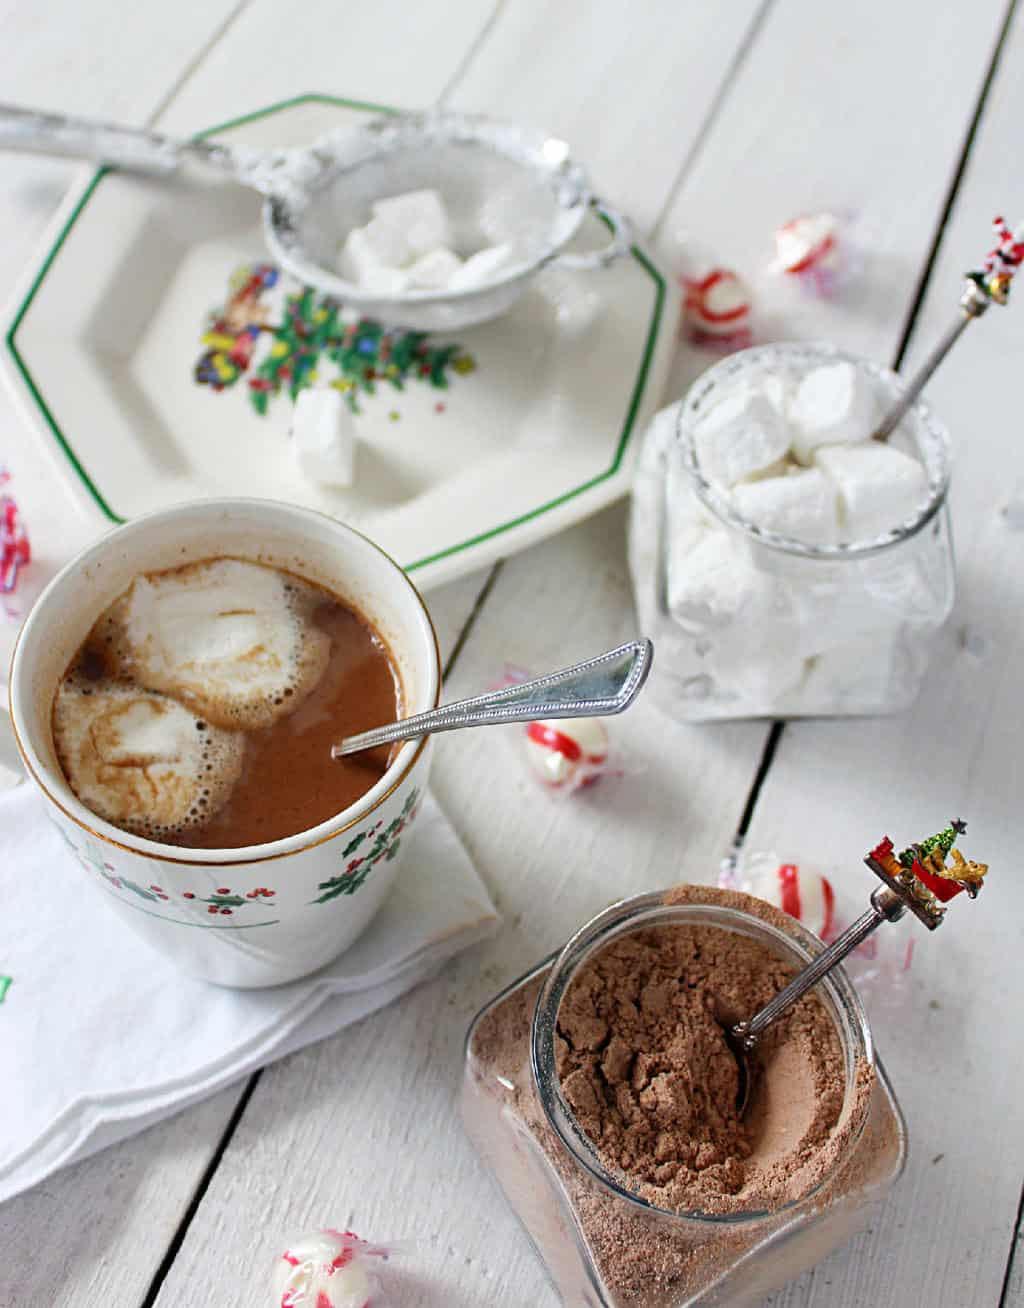 Homemade Hot Chocolate Mix With Powdered Creamer